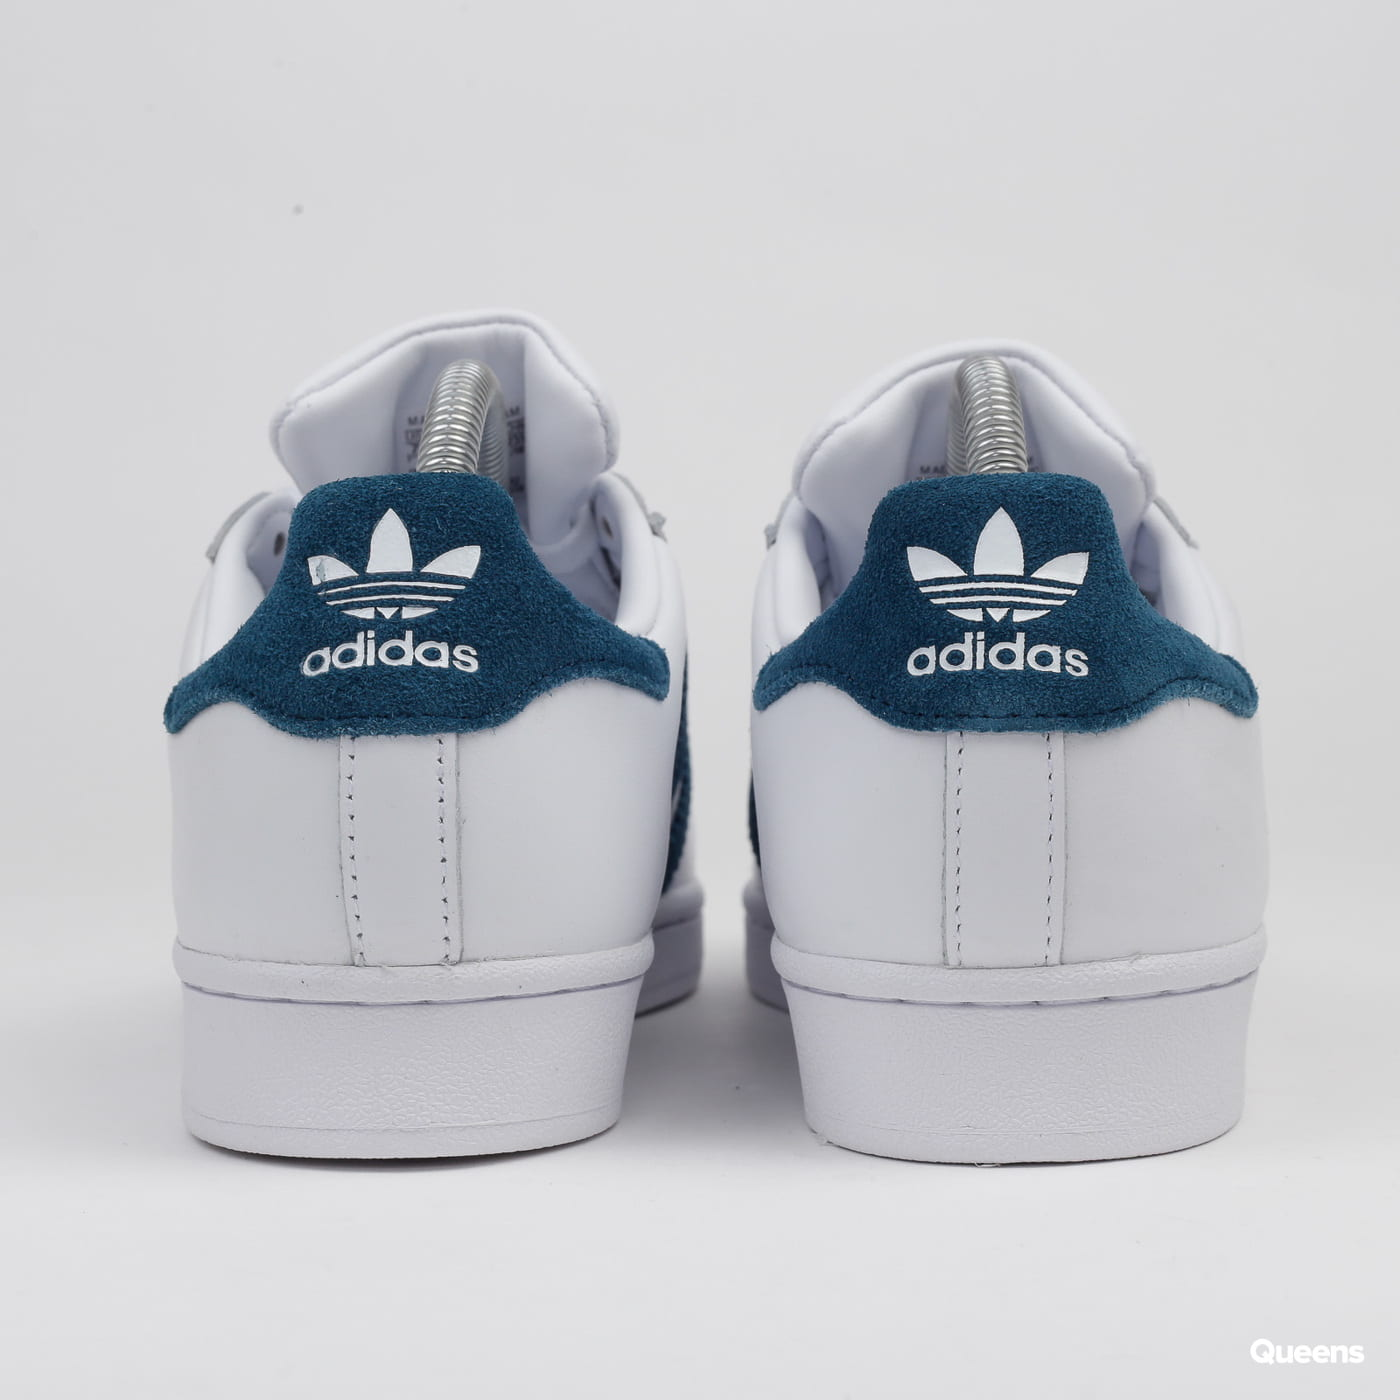 adidas Originals Superstar W ftwwht / tecmin / cblack